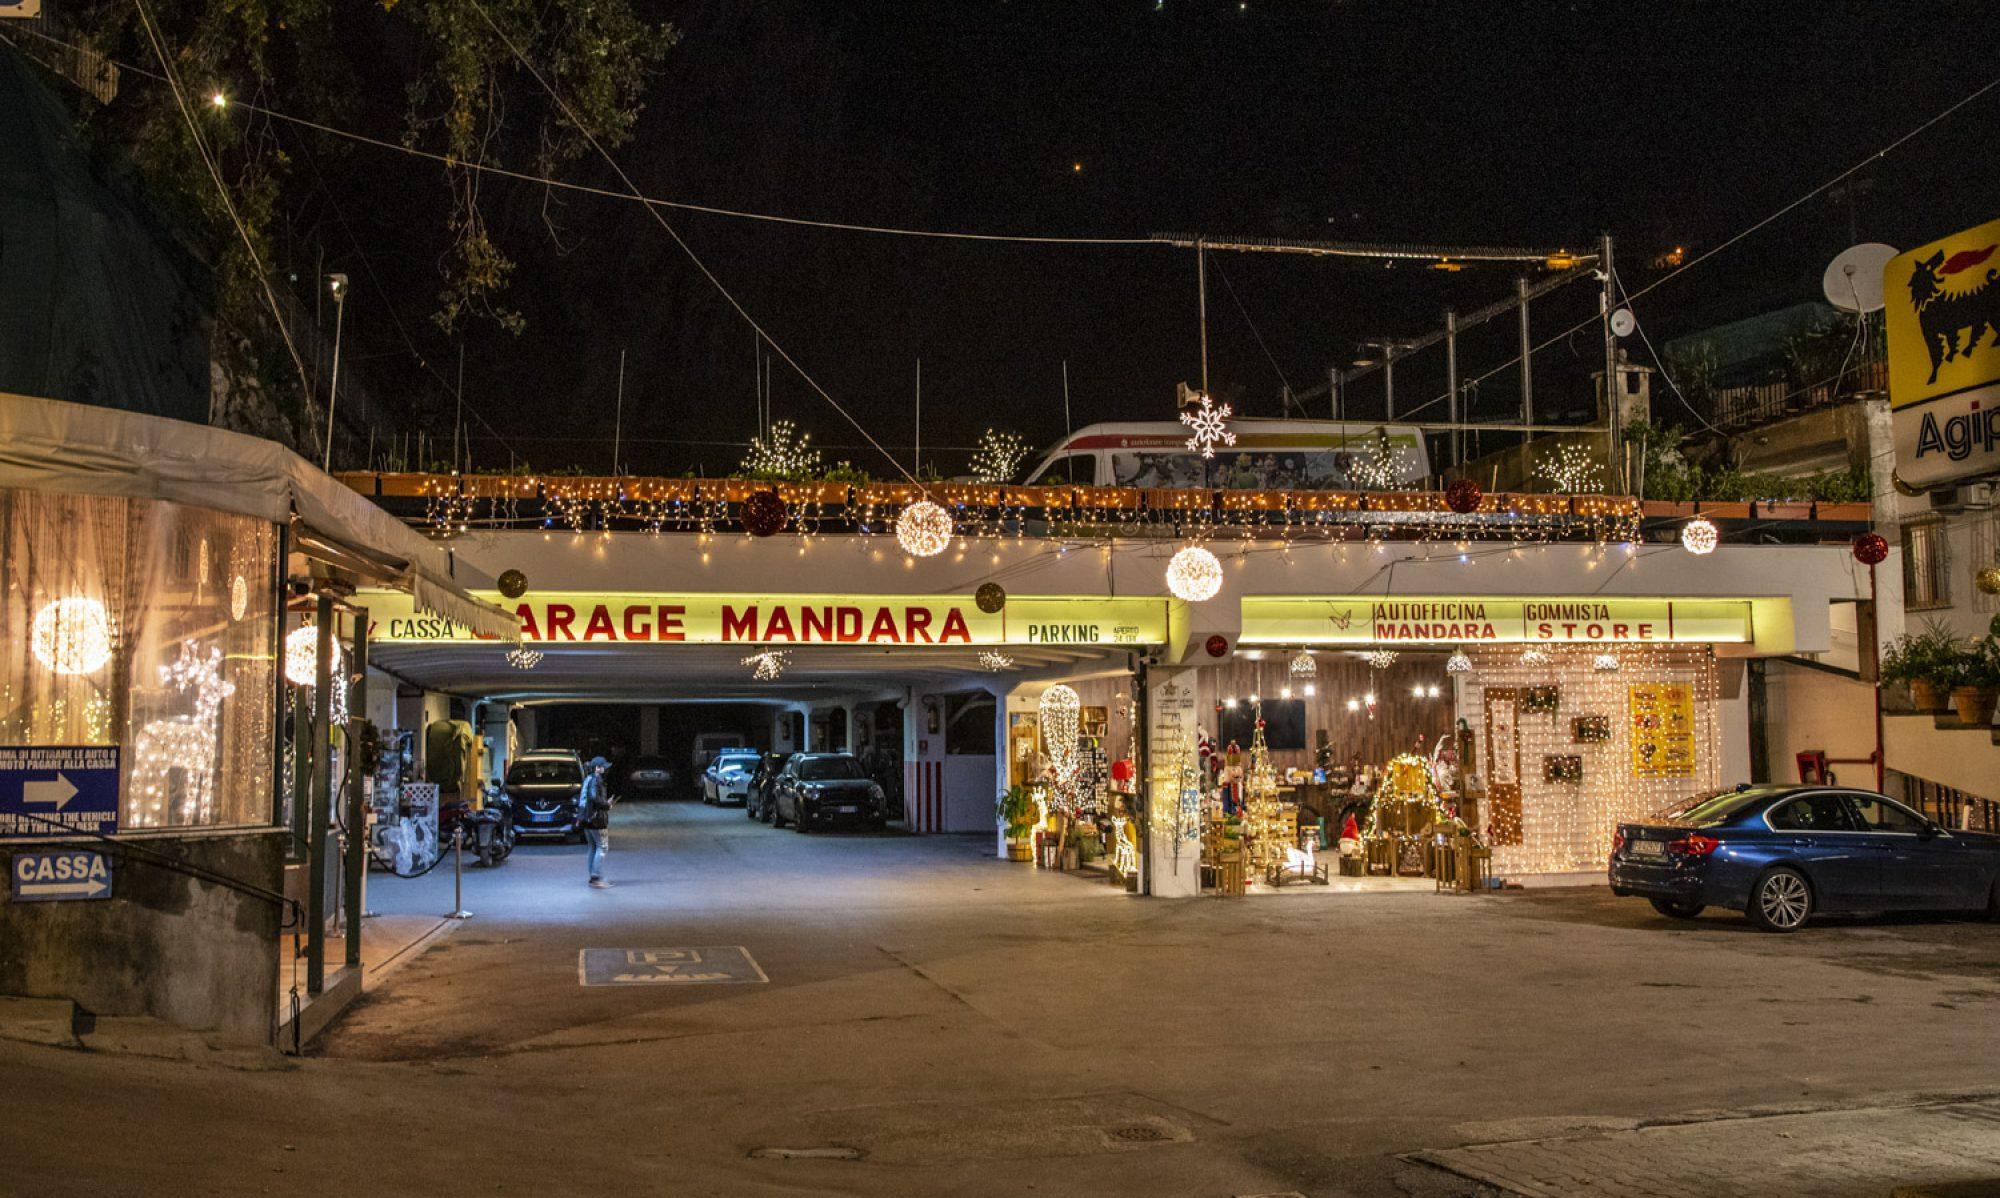 Mandara Parking and Store Positano